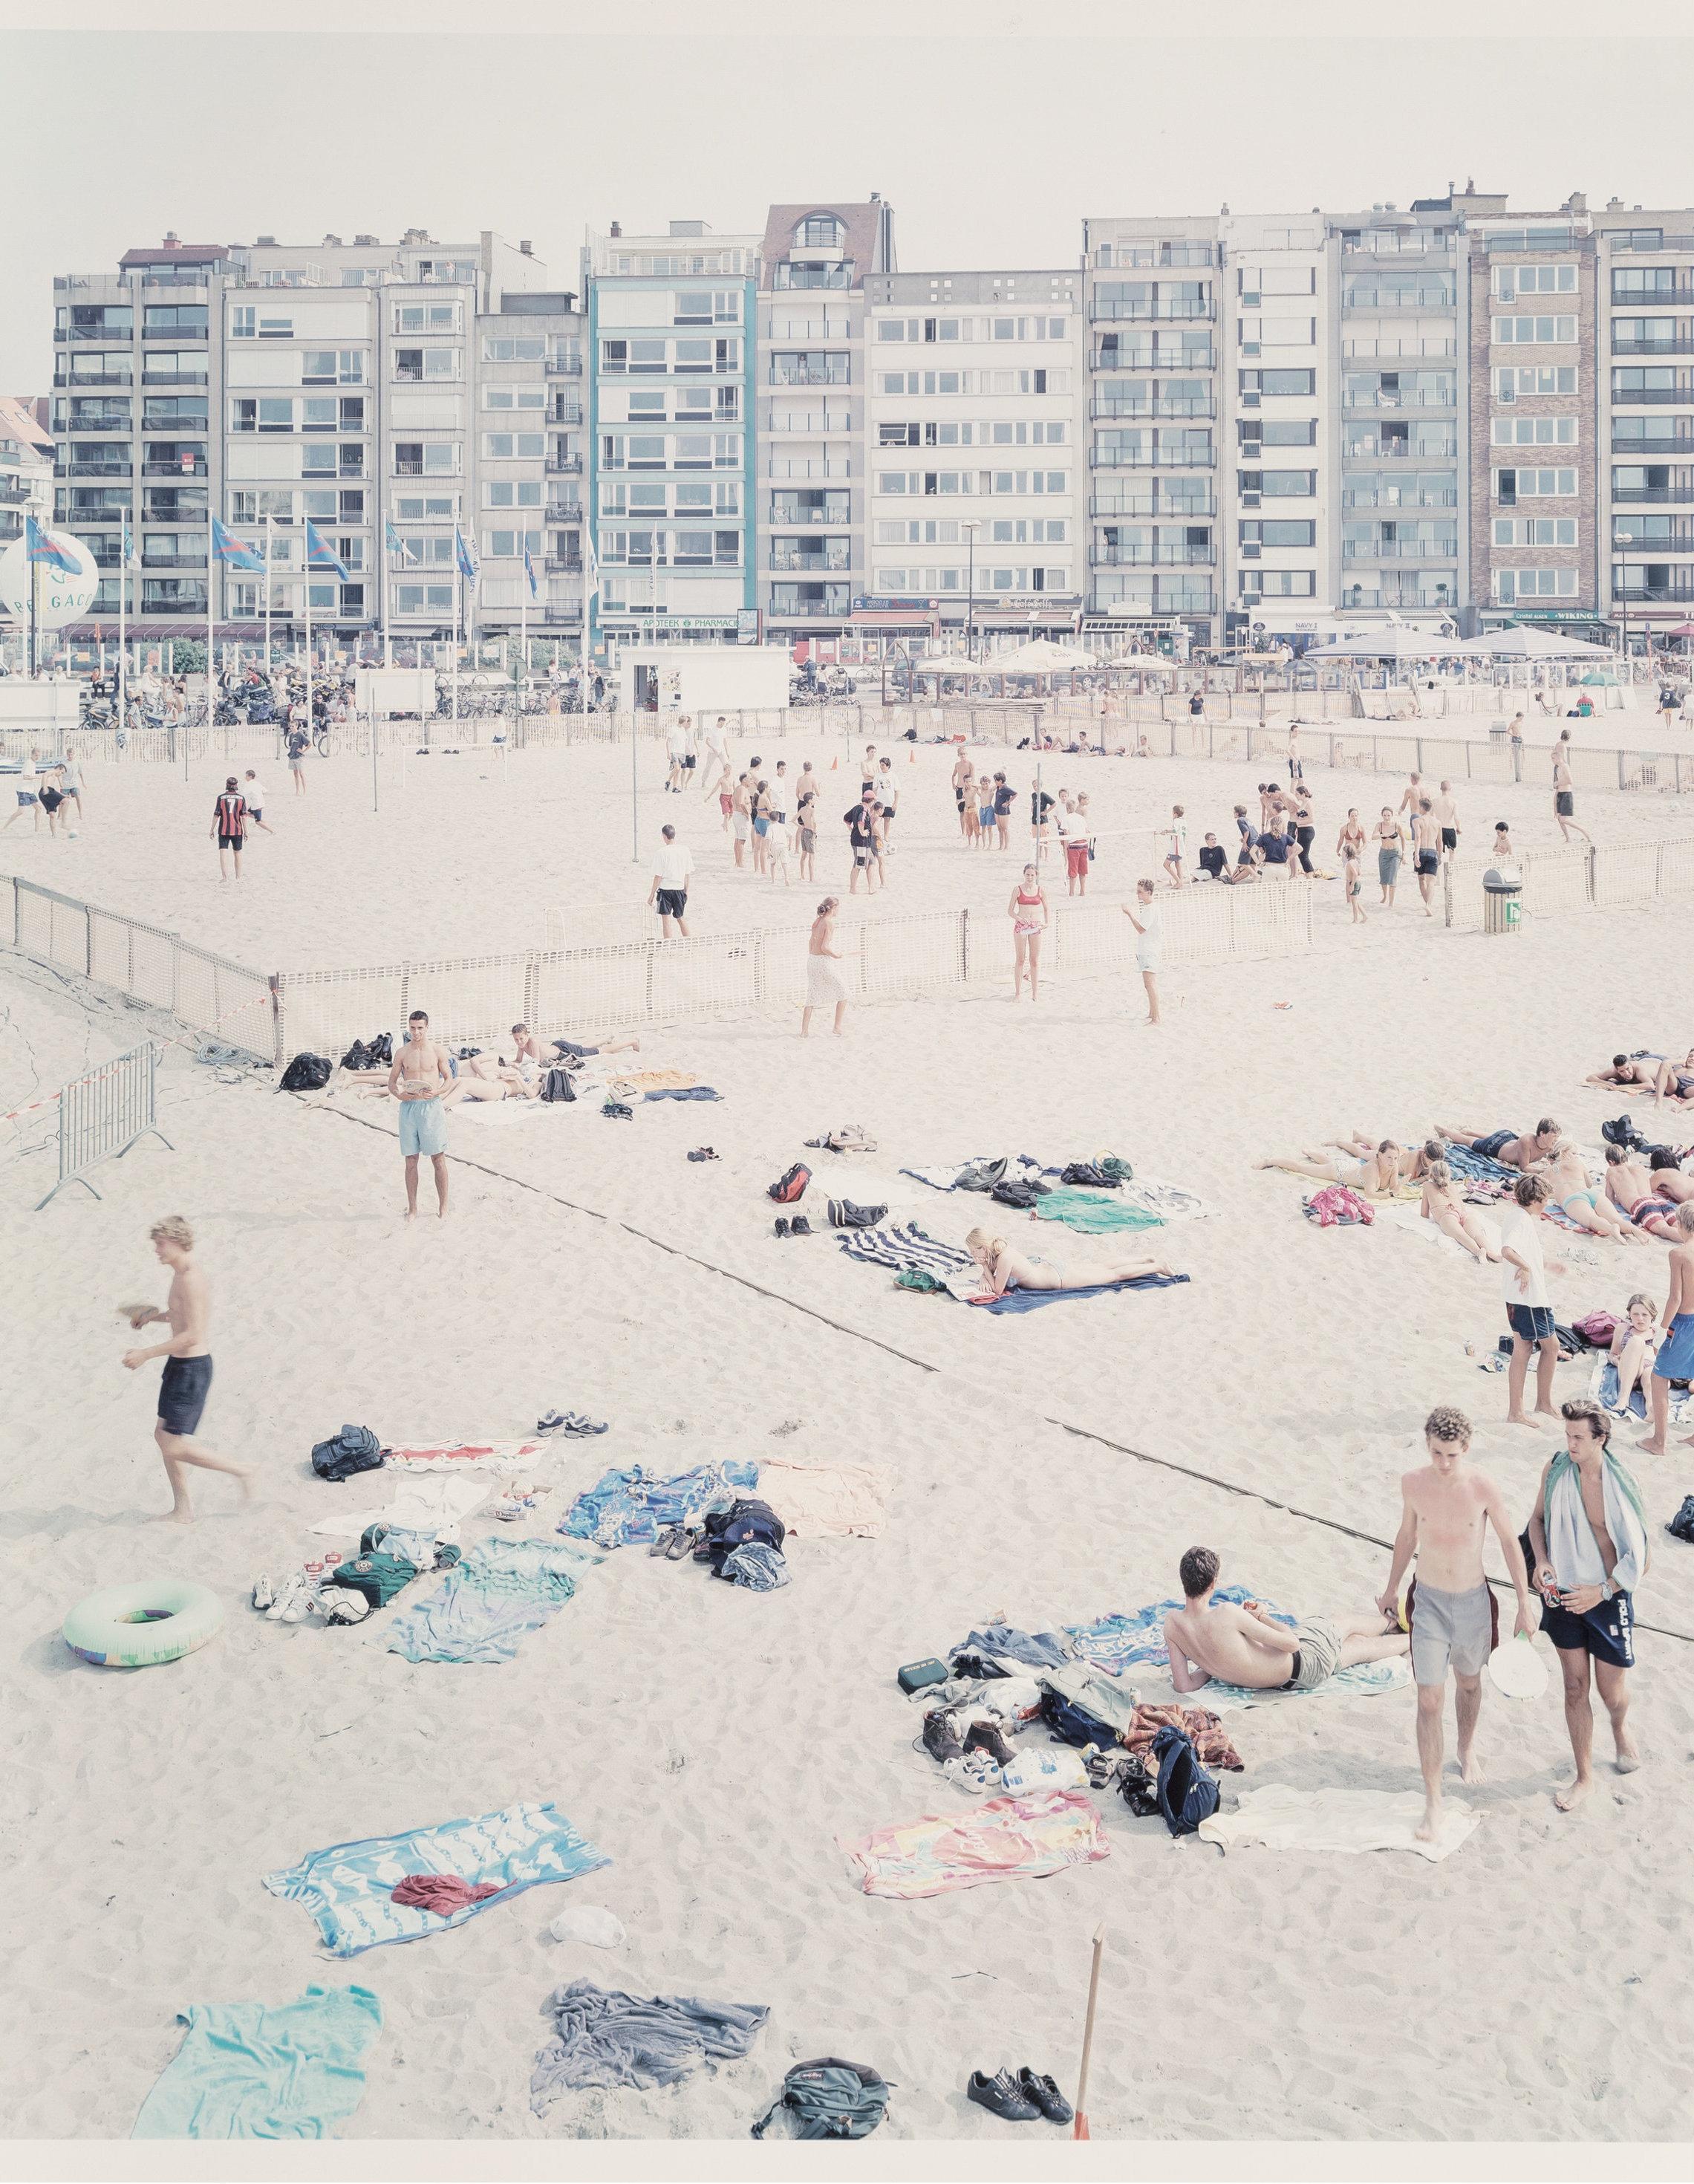 Massimo Vitali 'Knokke Beach' Artist's Proof Limited Edition Print